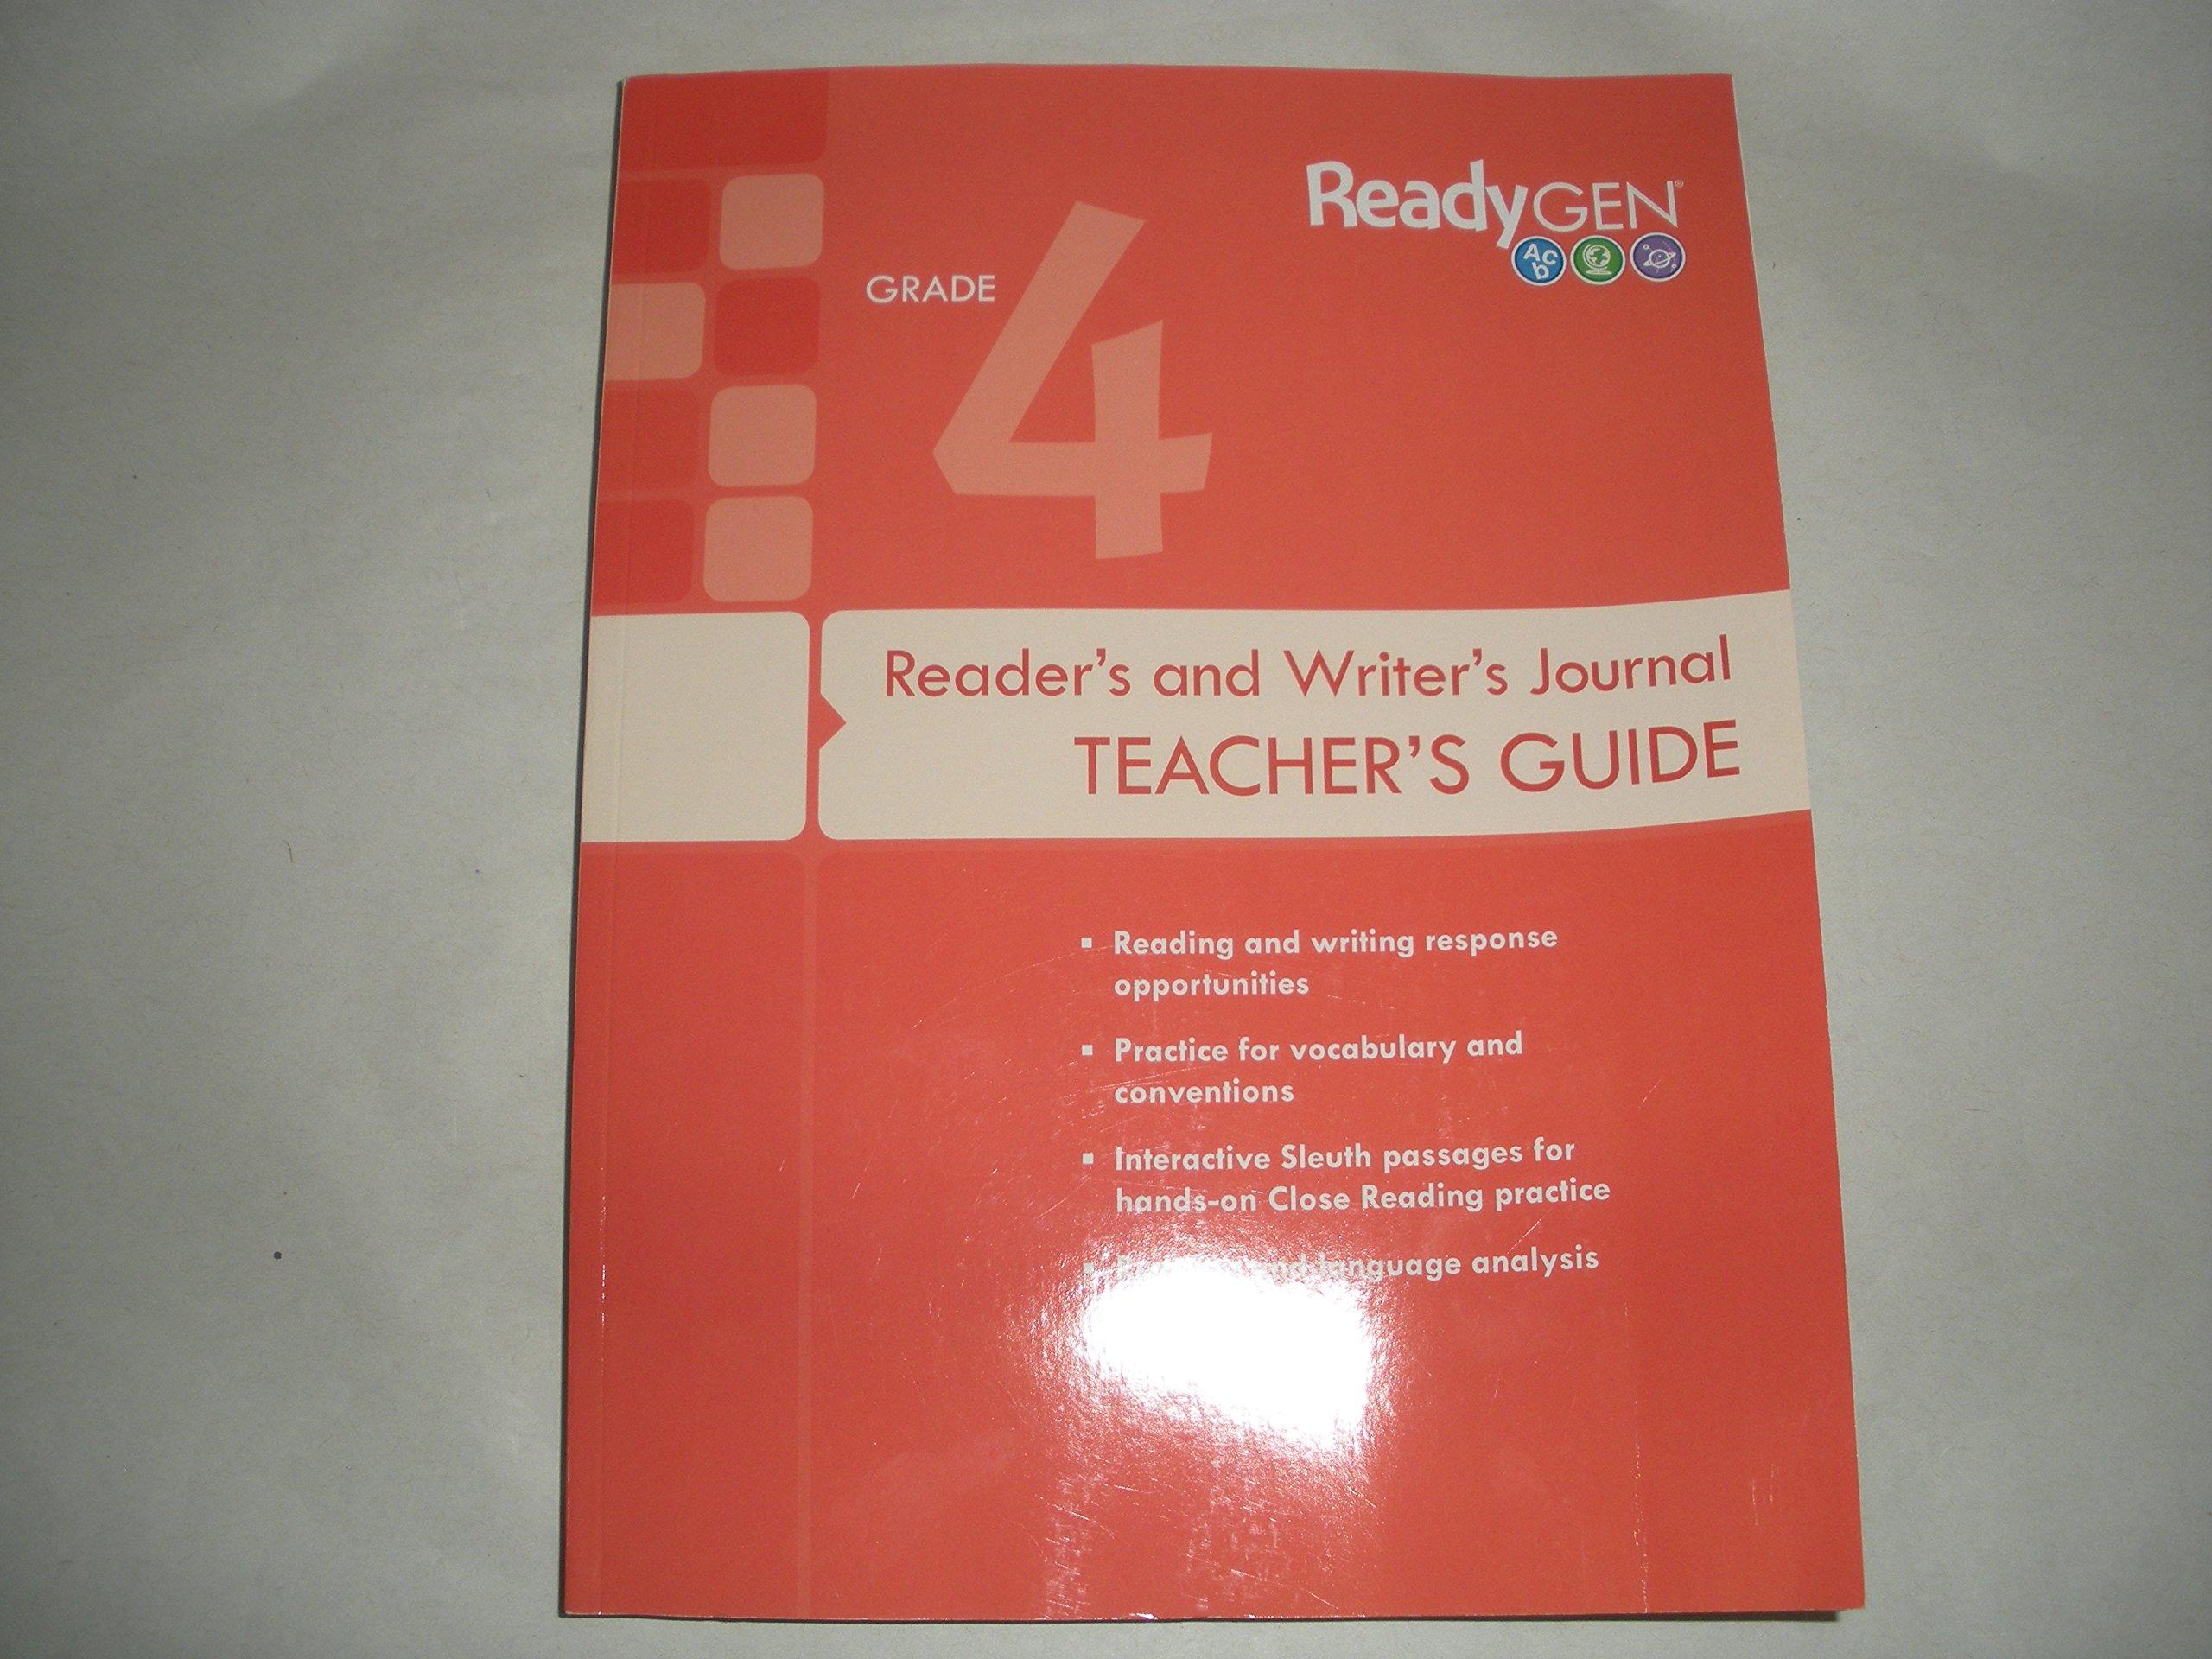 ReadyGen Grade 4 Reader's and Writer's Journal: Teacher's Guide:  9780328851669: Amazon.com: Books